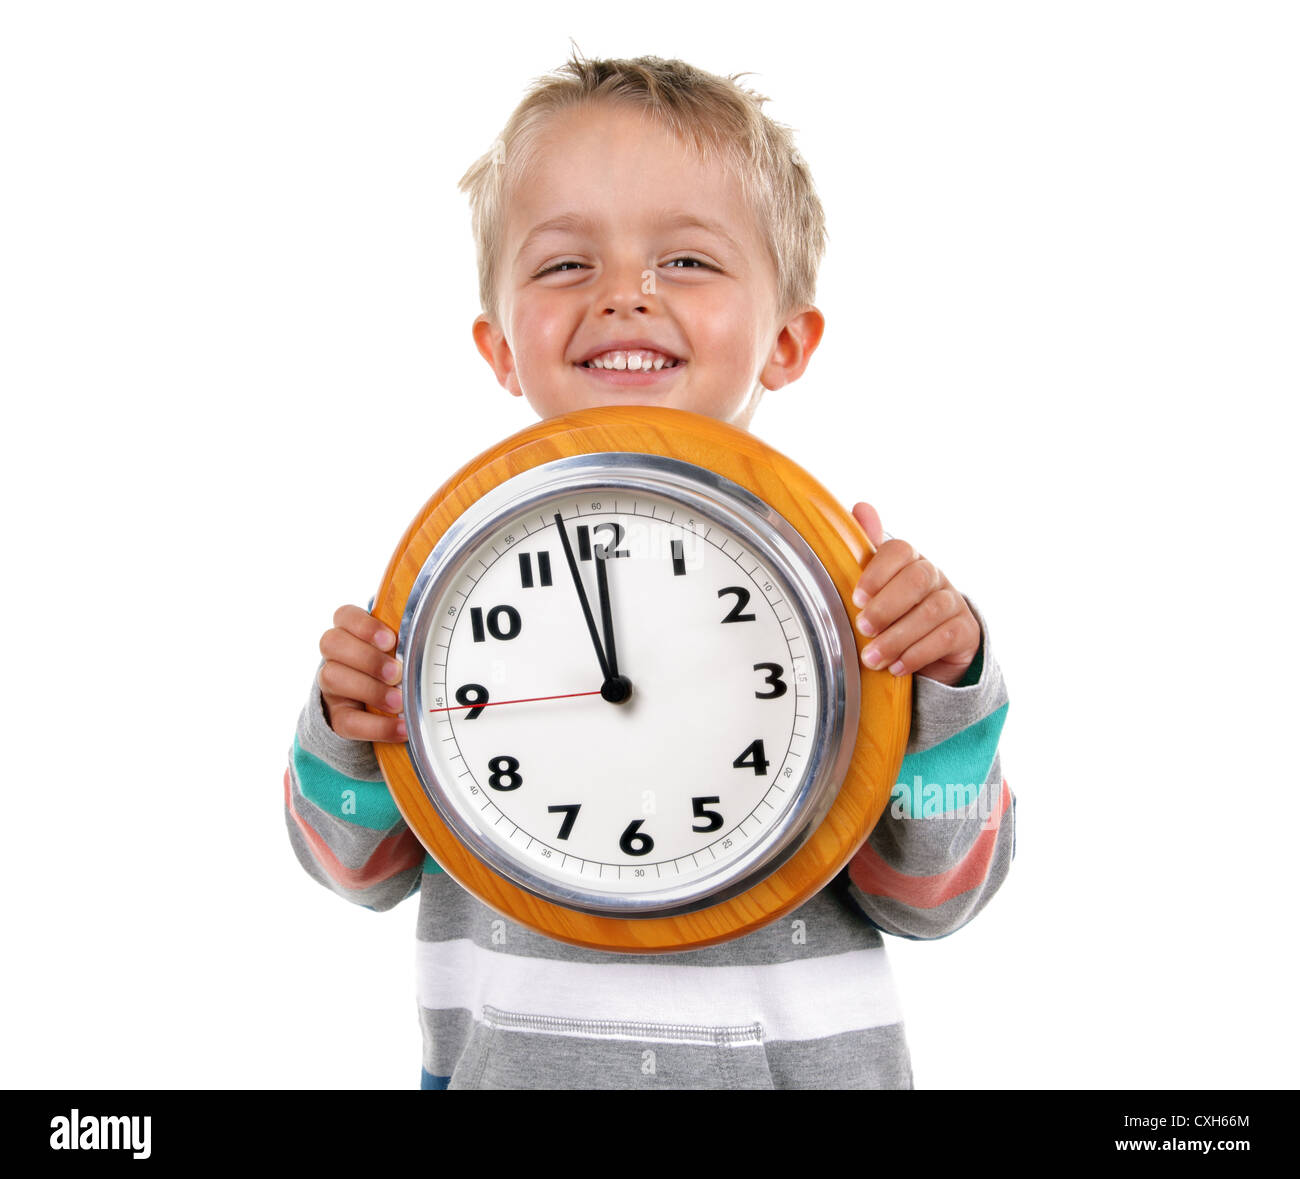 Chico con reloj Imagen De Stock